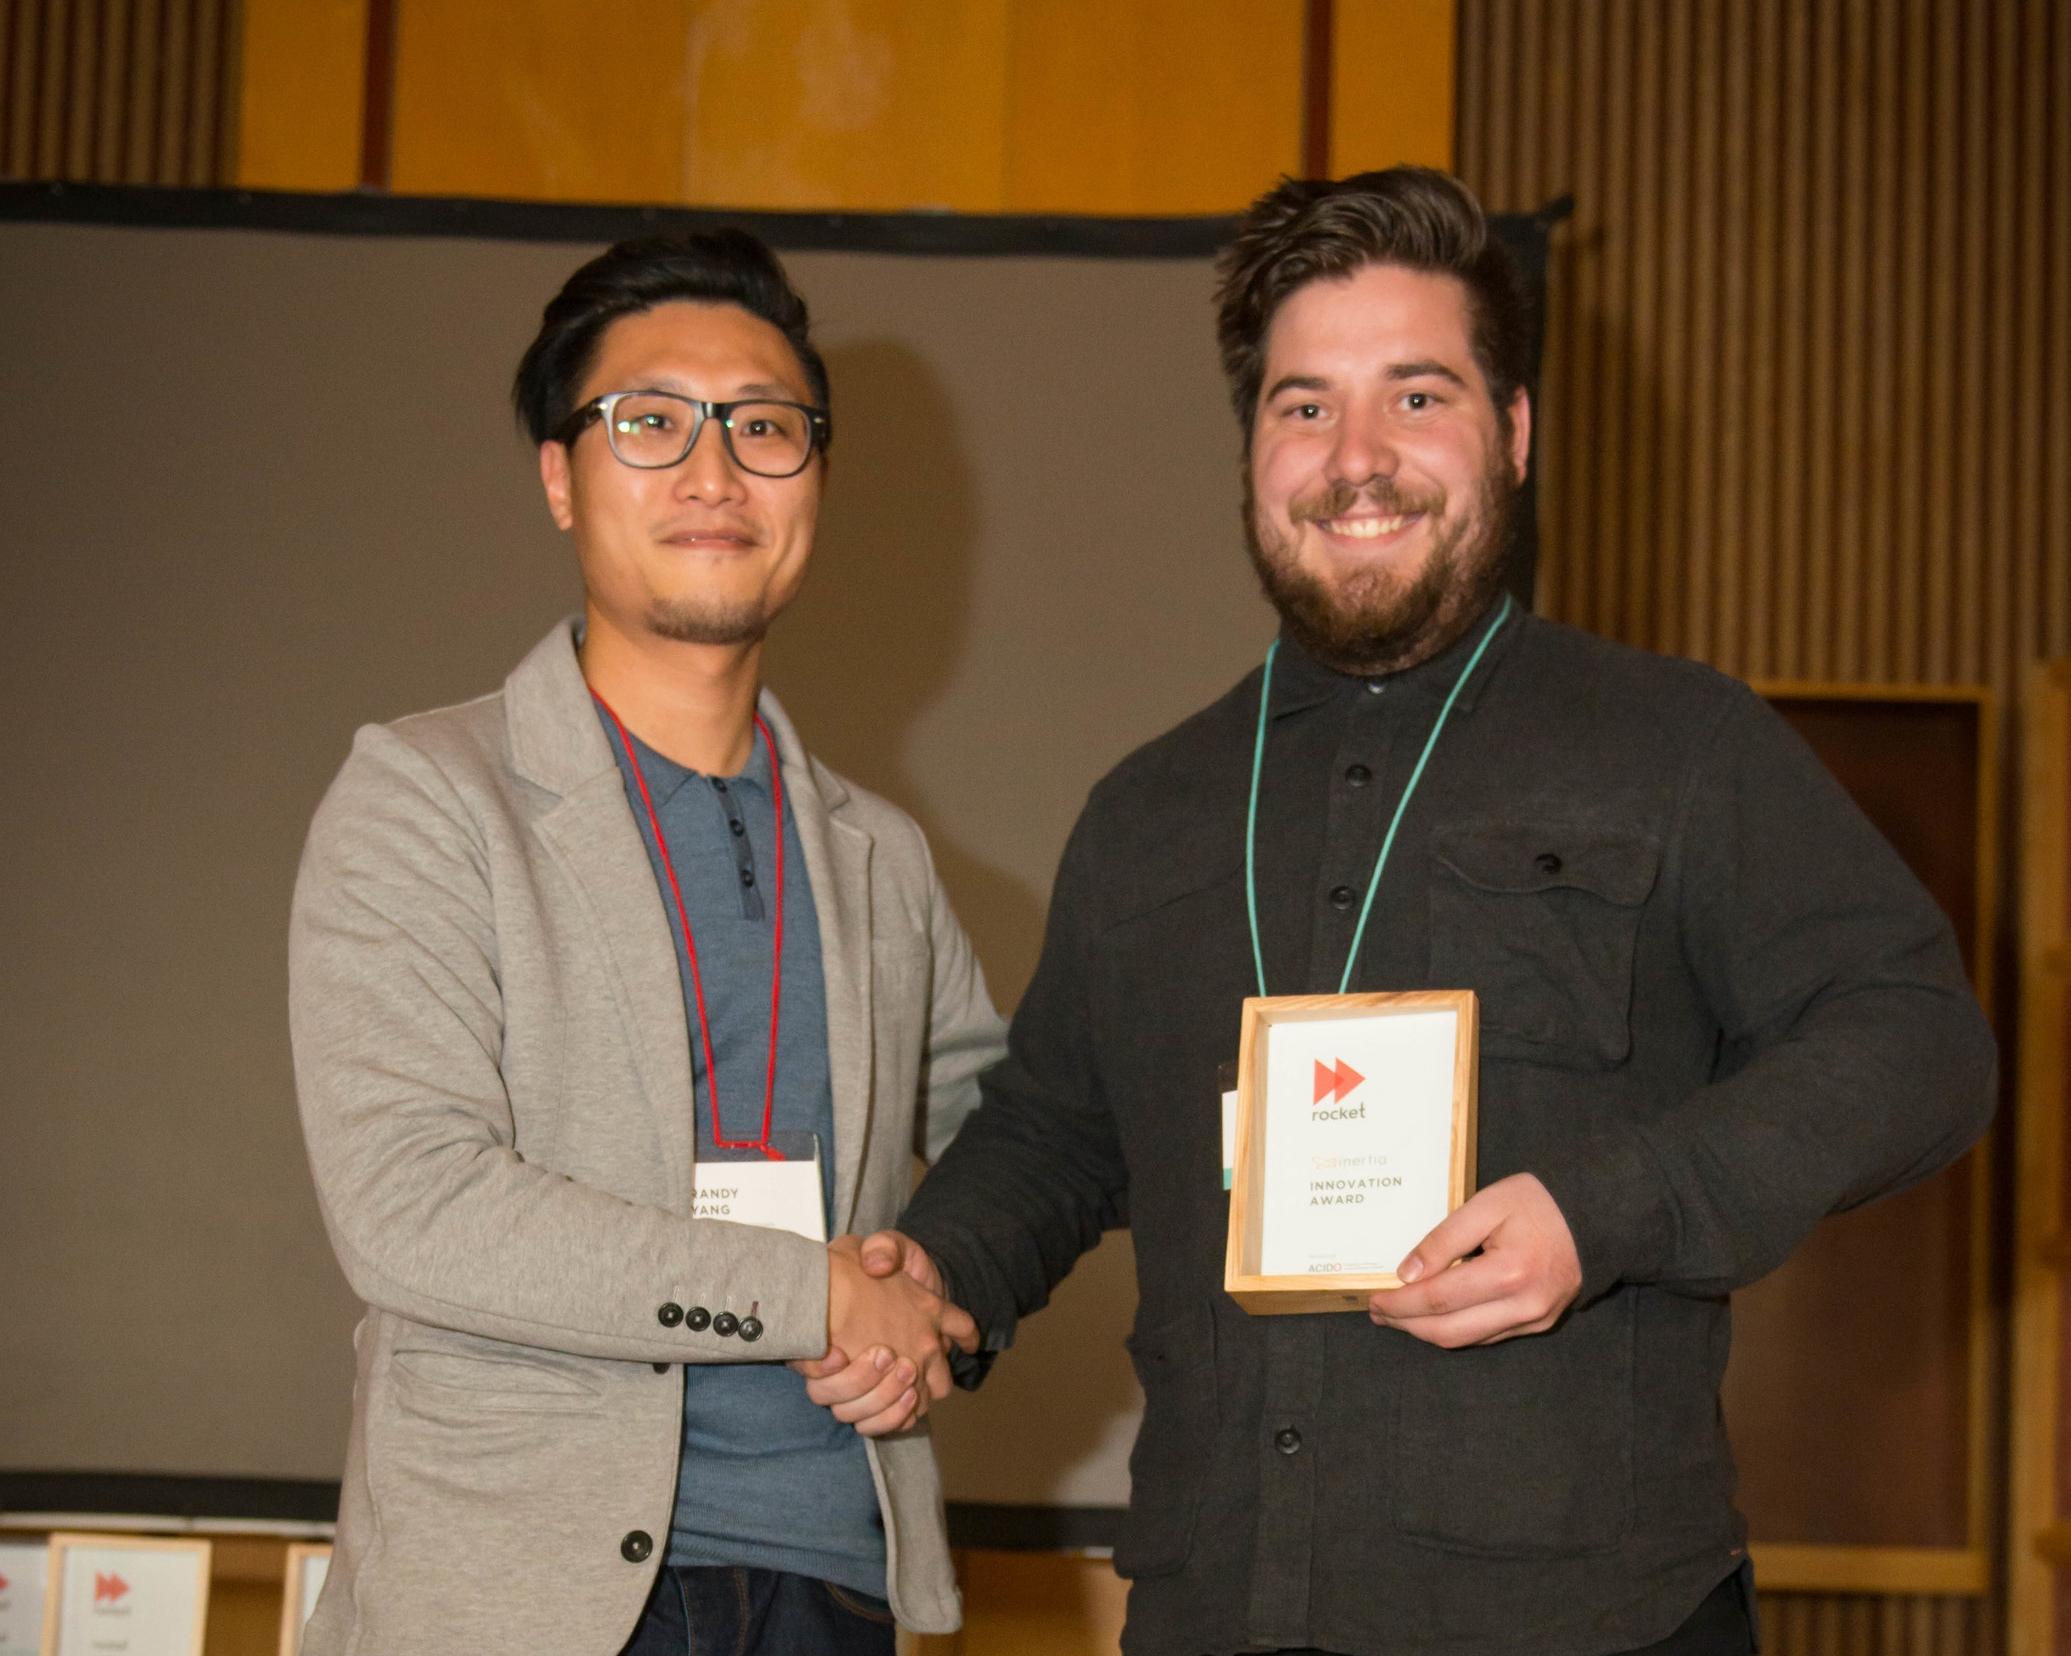 Jack Morris accepting the Inertia Innovation Award from Randy Yang at Inertia.